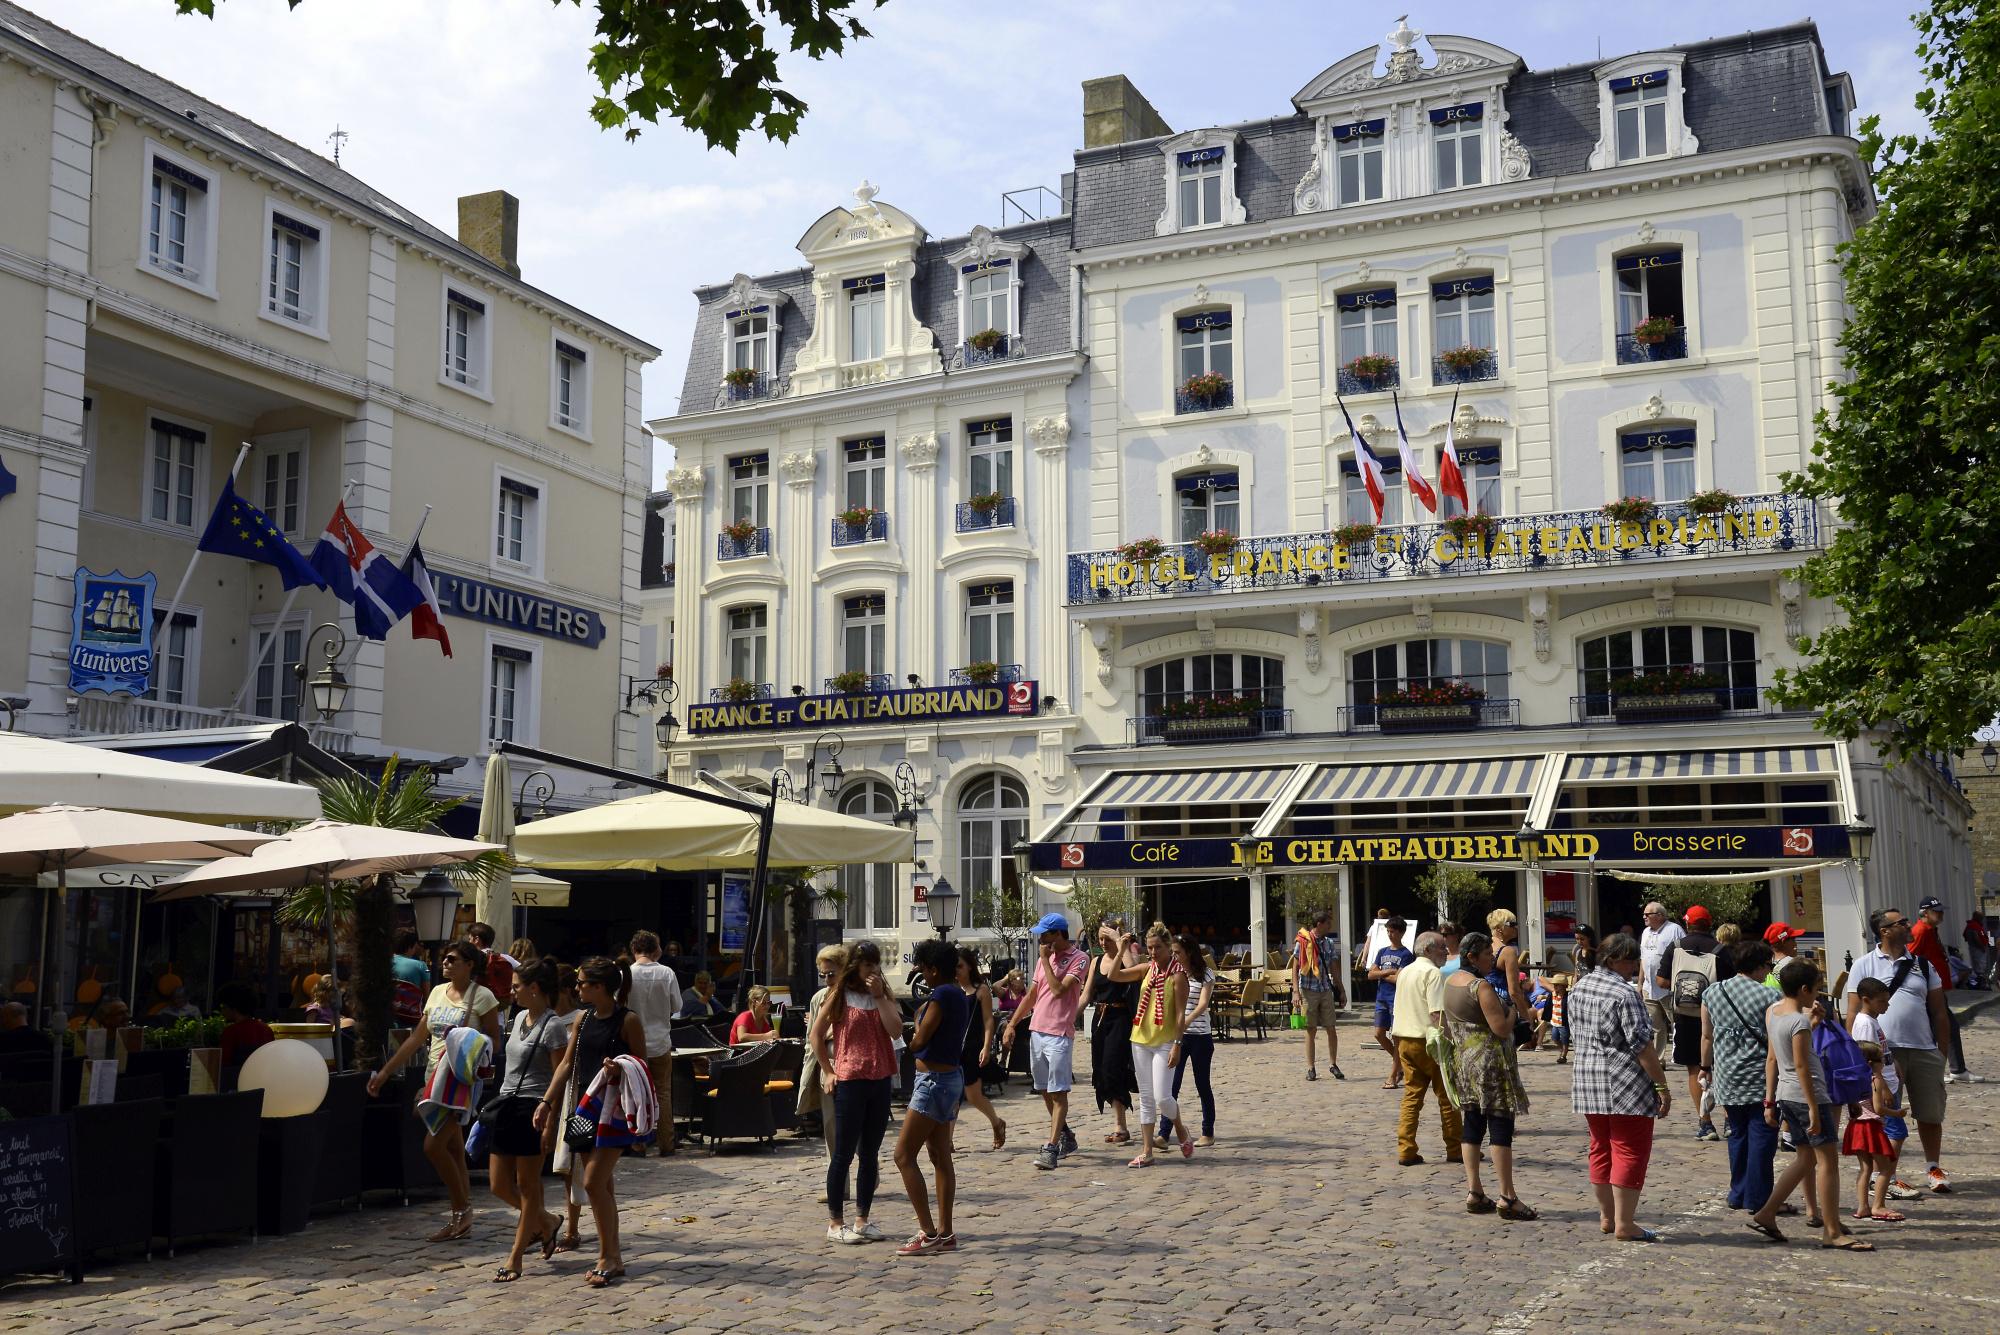 St malo ville close 5 saint malo pictures france for B b saint malo